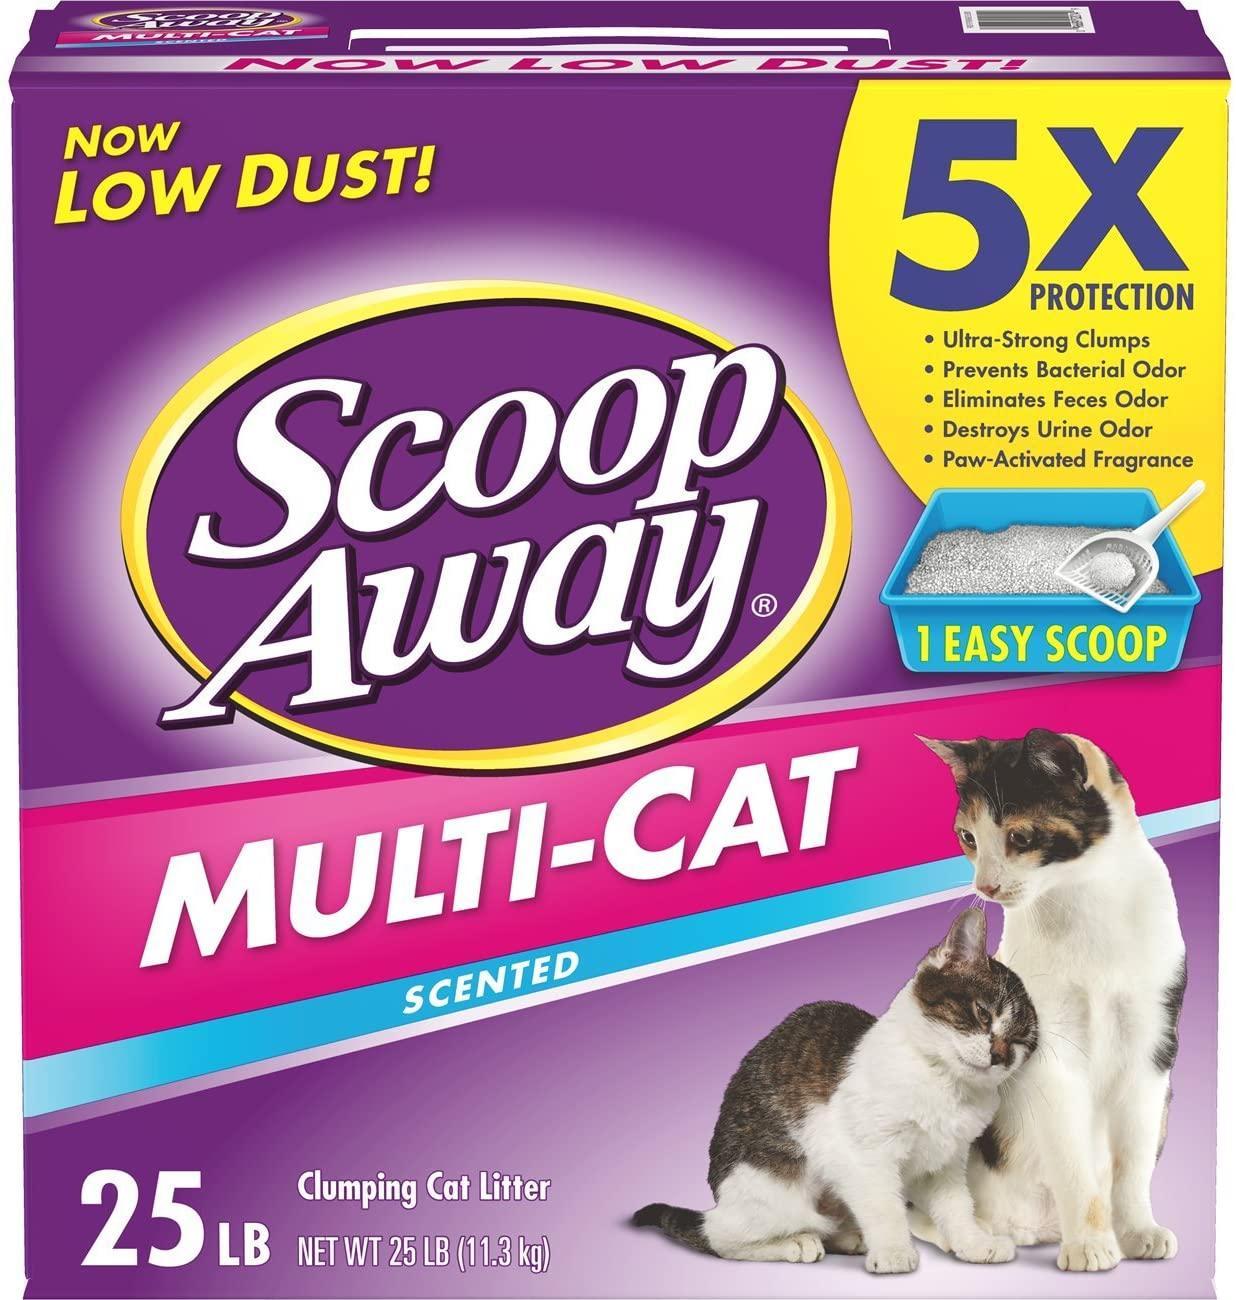 Scoop Away Multi-Cat Scented Cat Litter, 25-lb